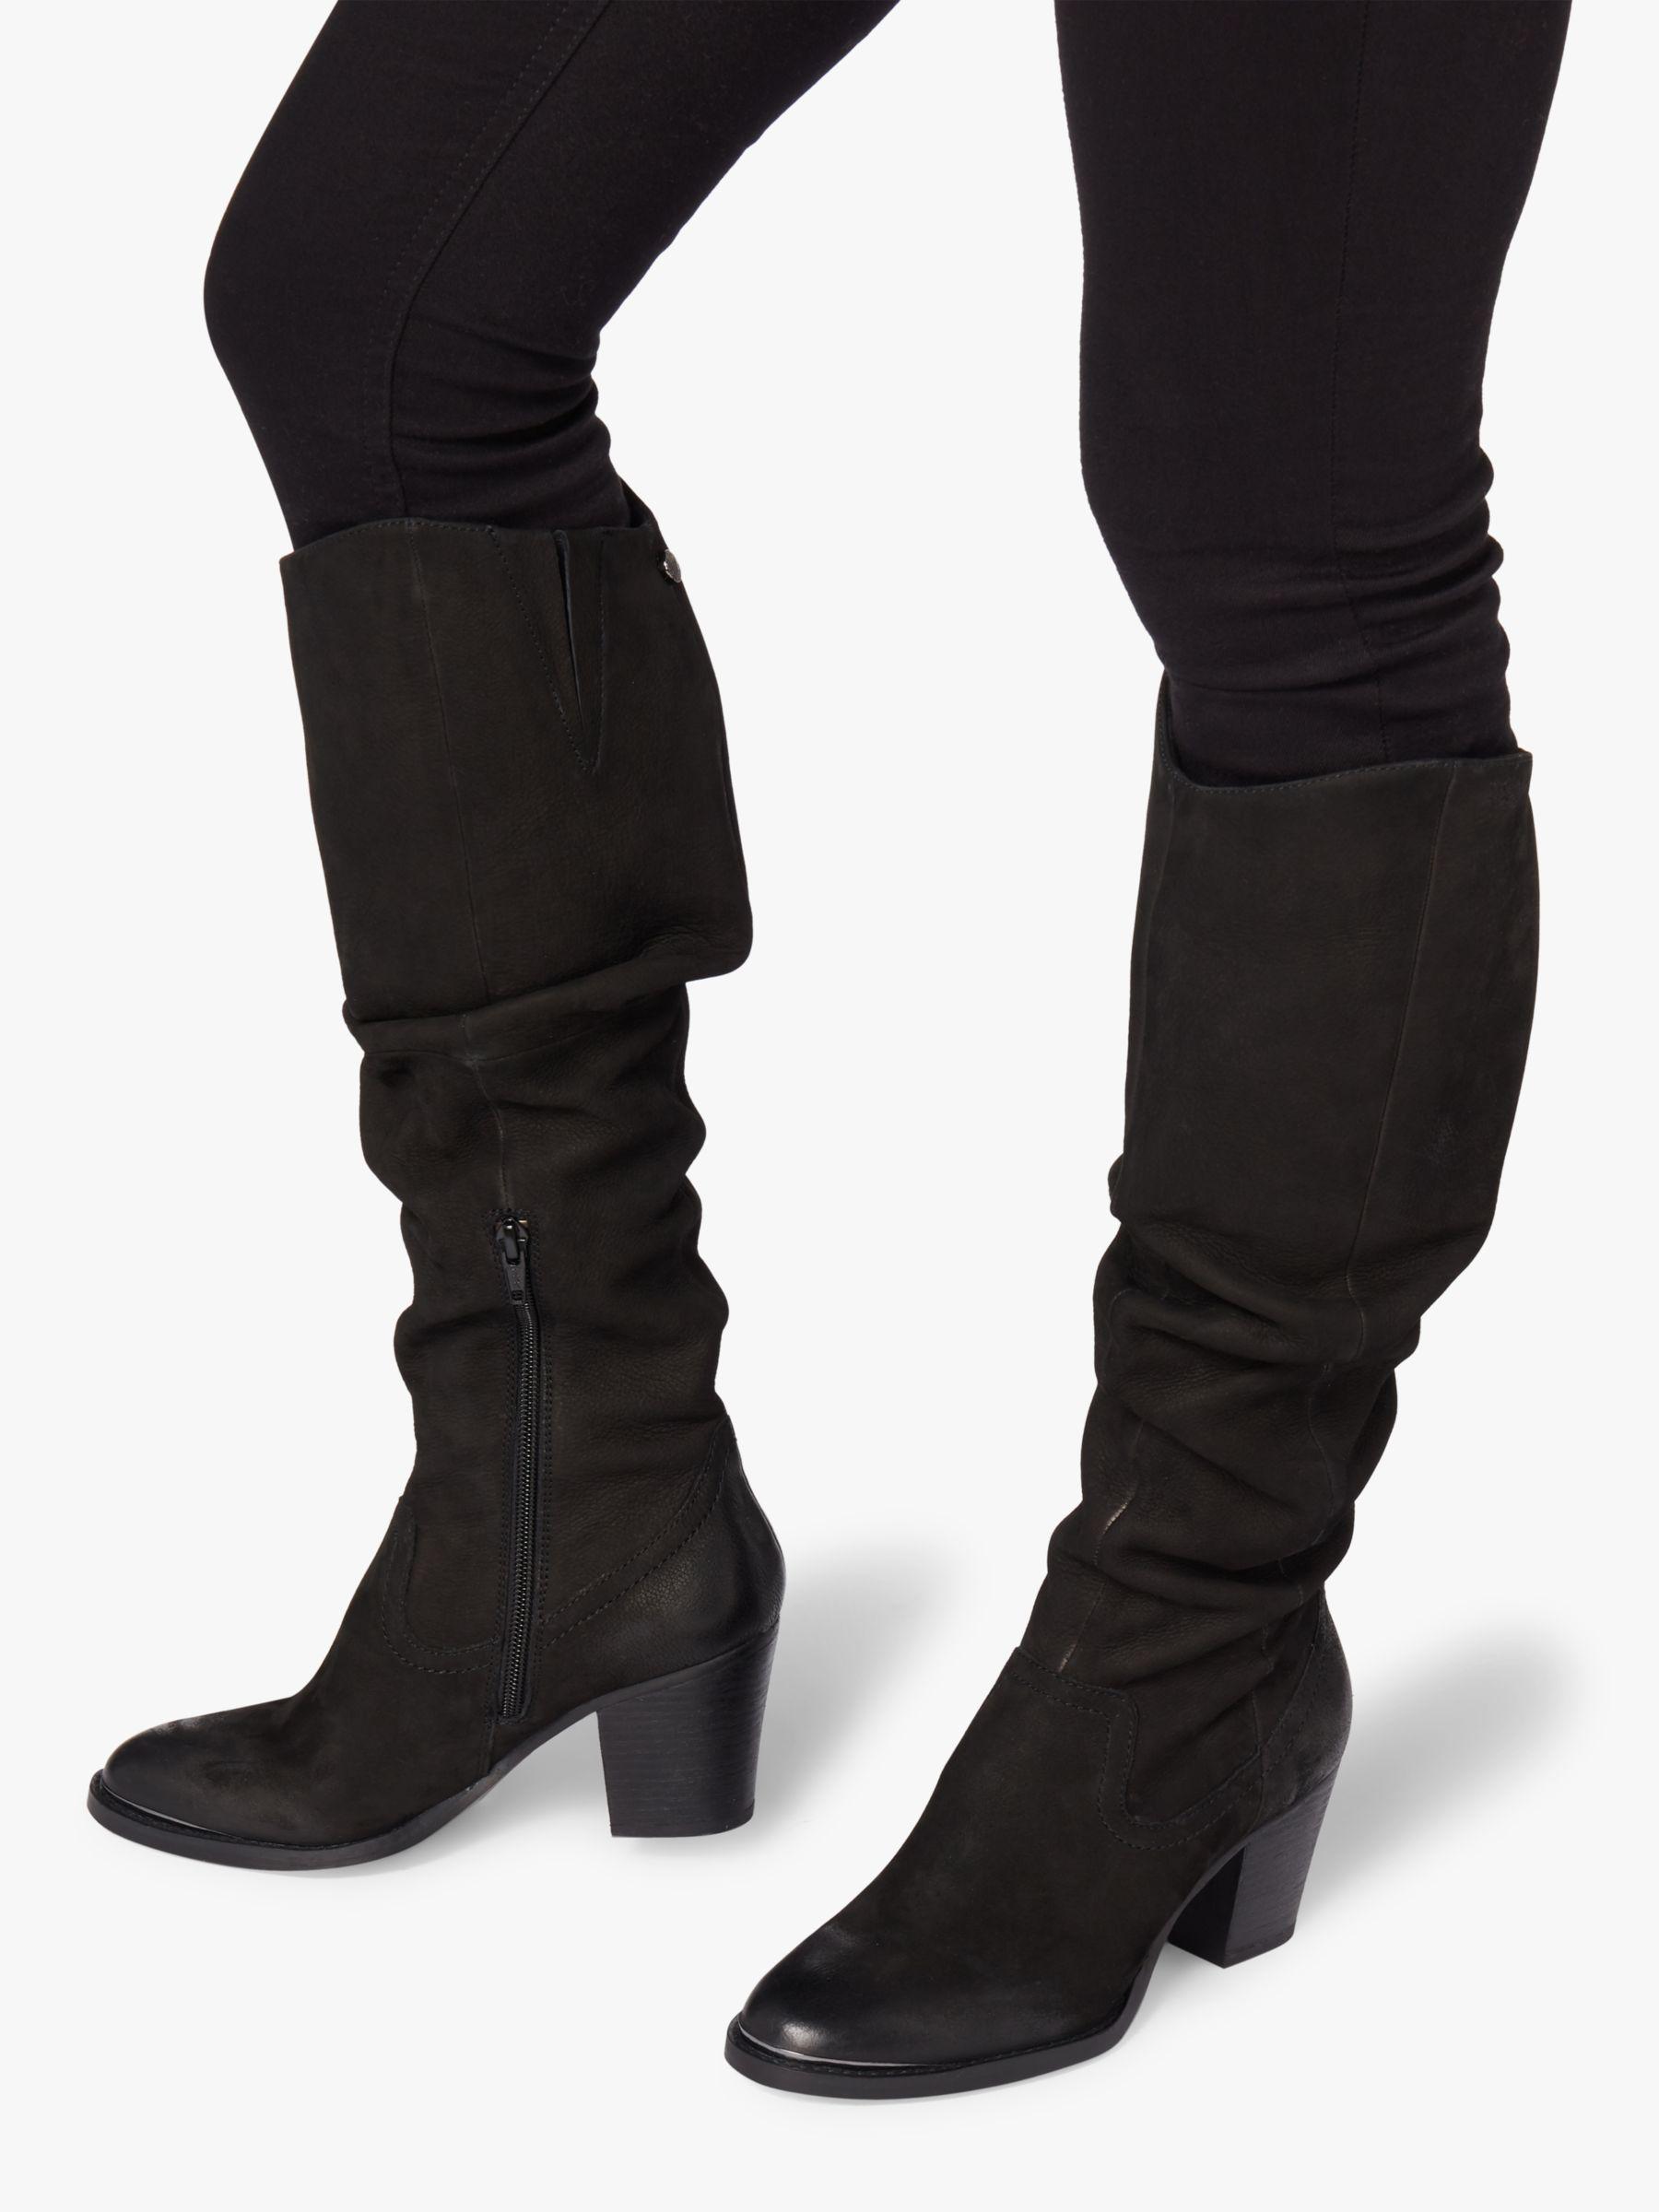 fd1d9ddceff Steve Madden Rova Knee High Boots in Black - Lyst